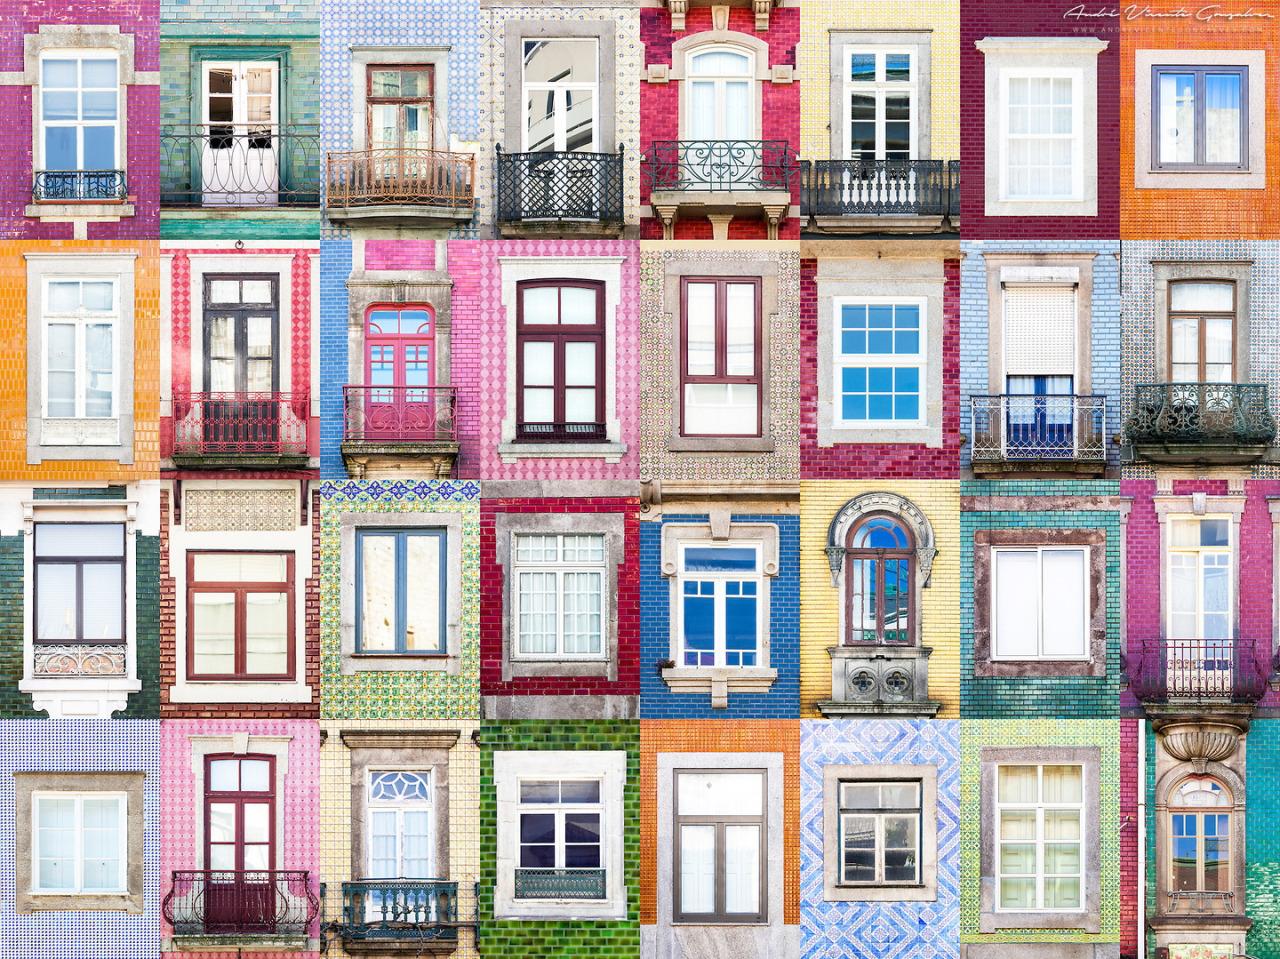 Kolaž prozora fotografa Andre Vincente Goncalves